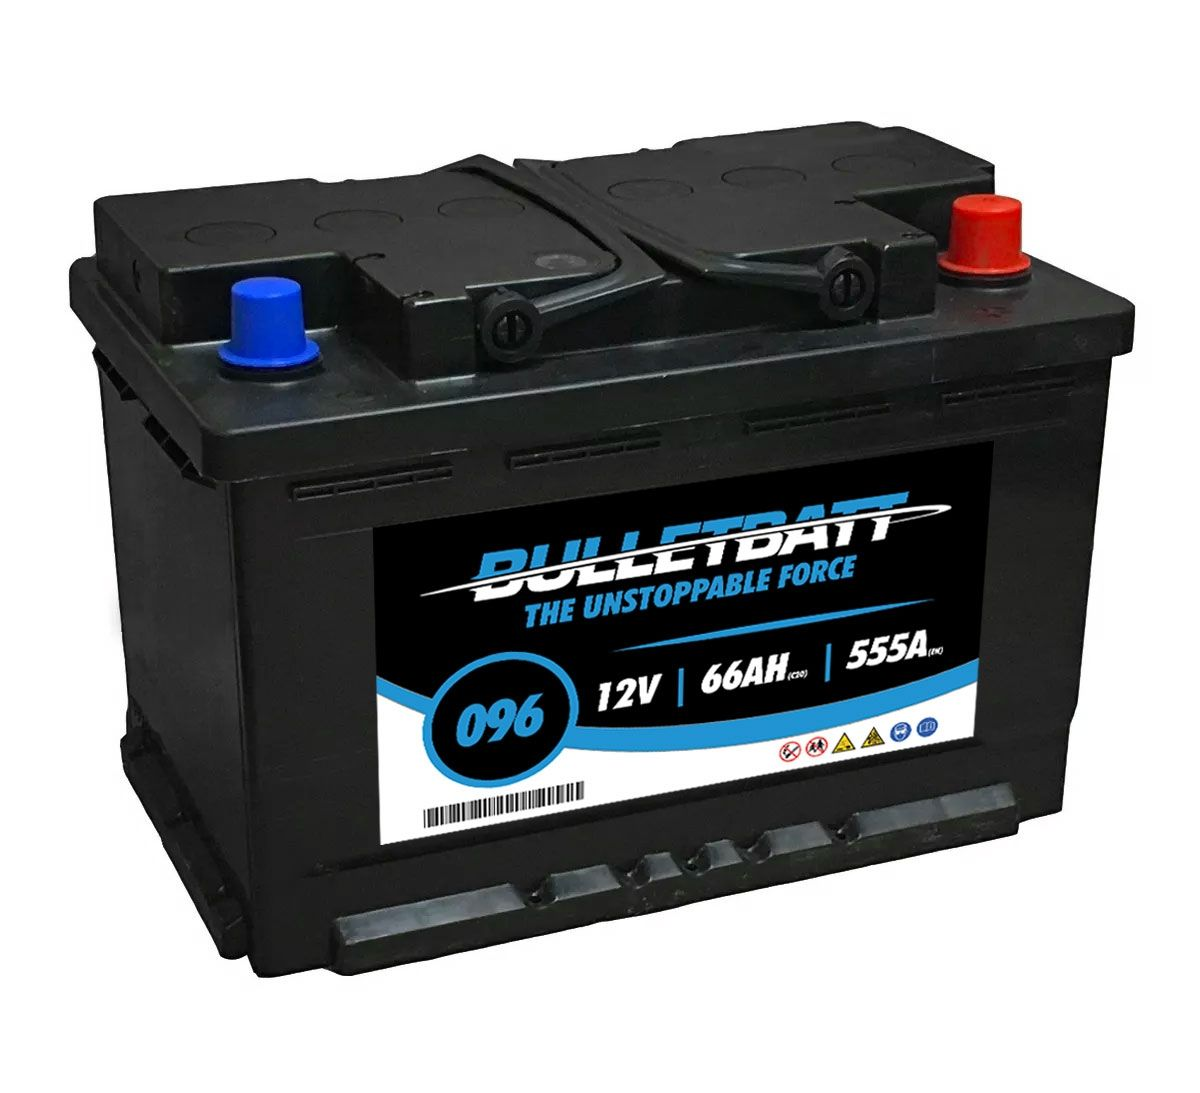 096 Powerline Batterie de Voiture 12V